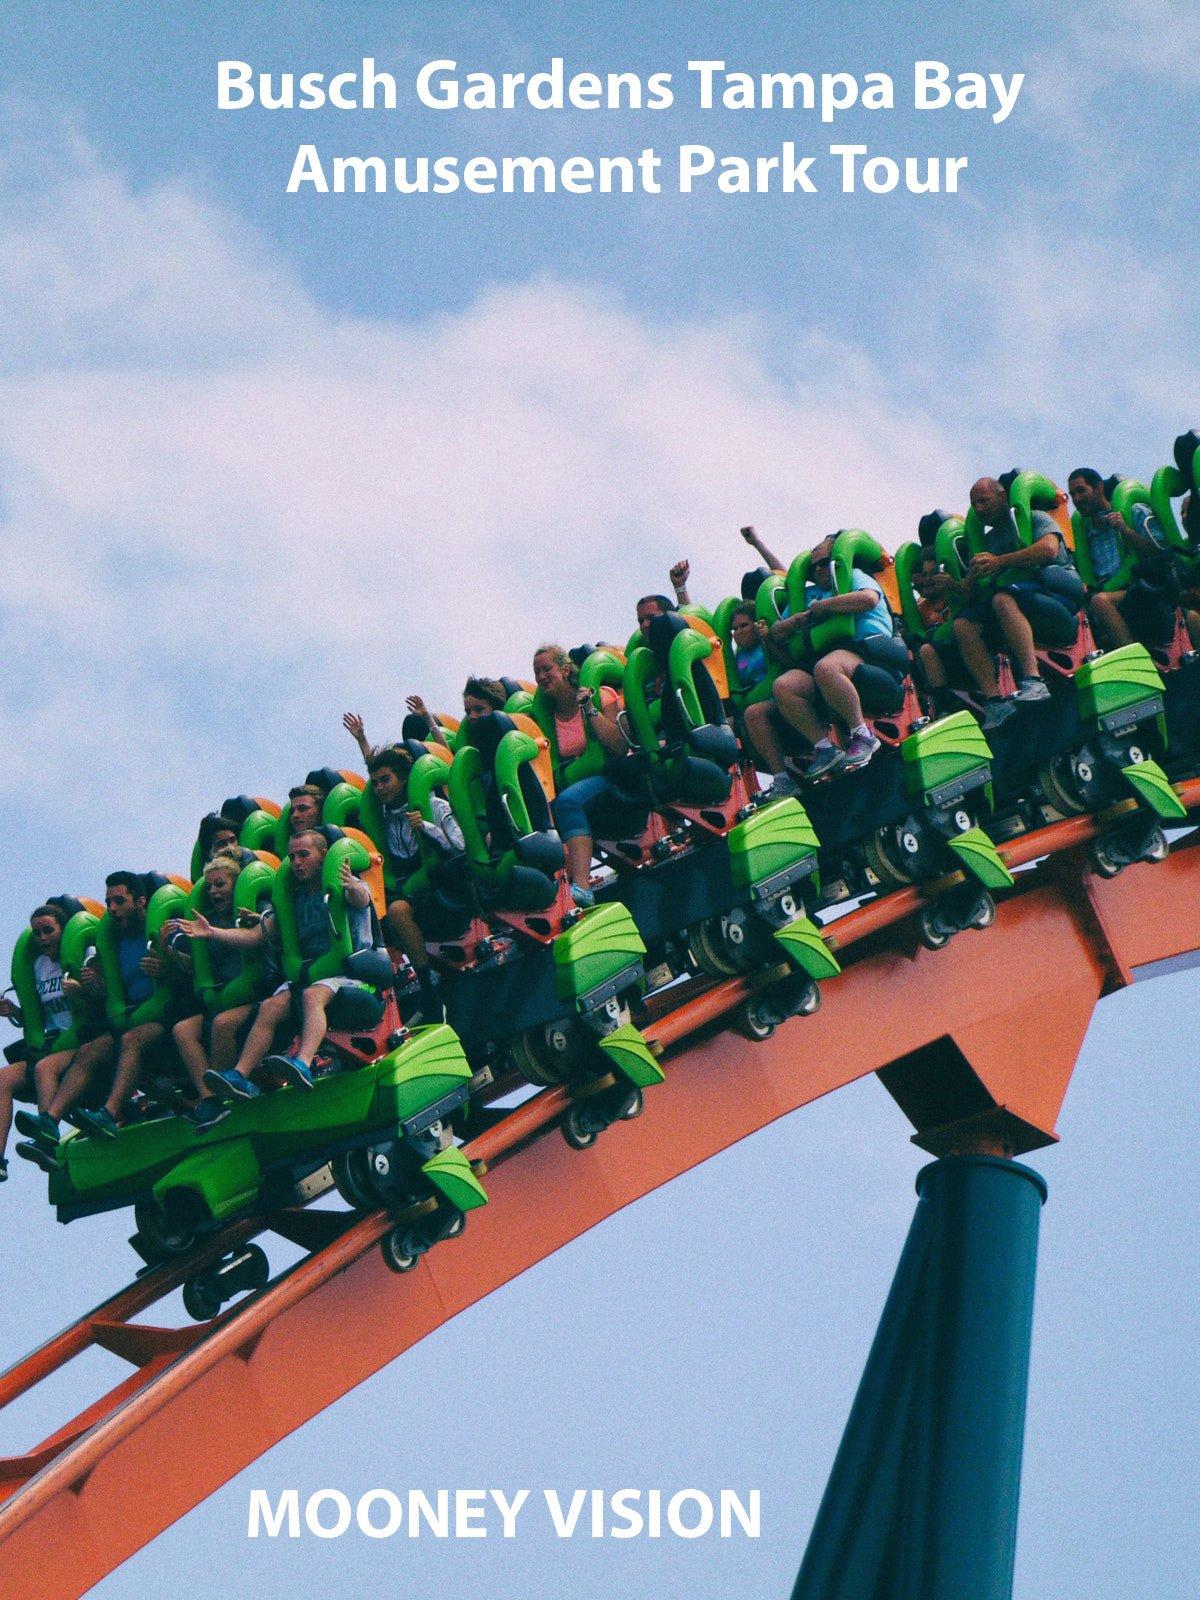 Busch Gardens Tampa Bay Amusement Park Tour